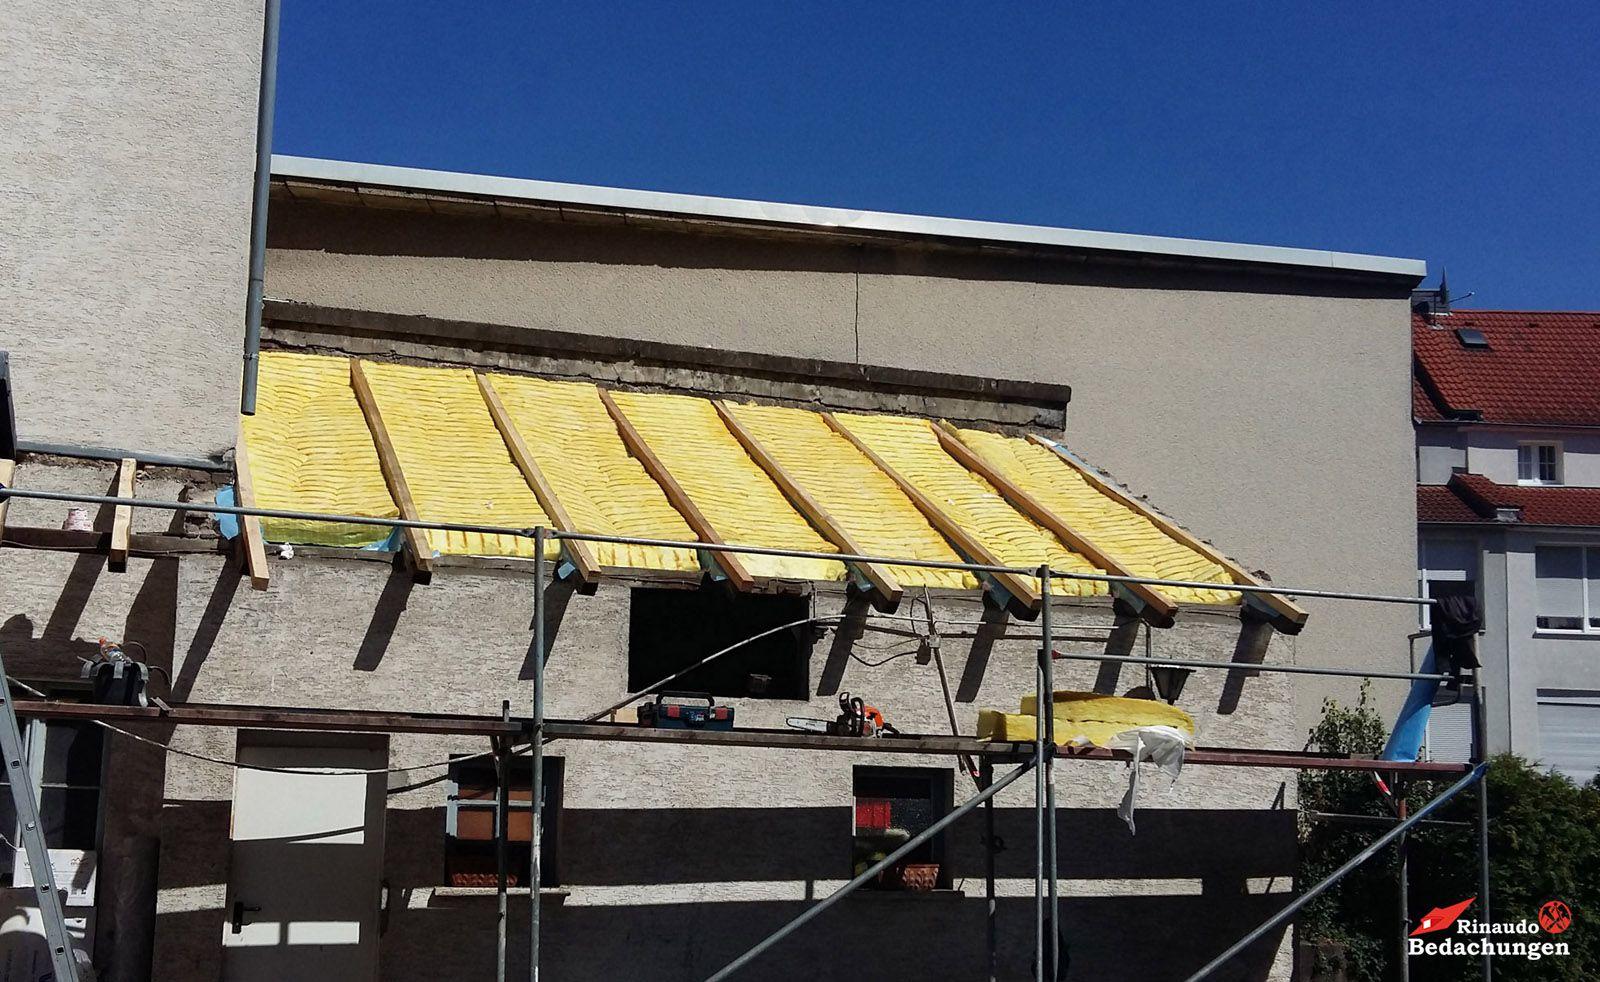 Wärmedämmung Köln wärmedämmung nach enev rinaudo bedachungen dachdecker köln